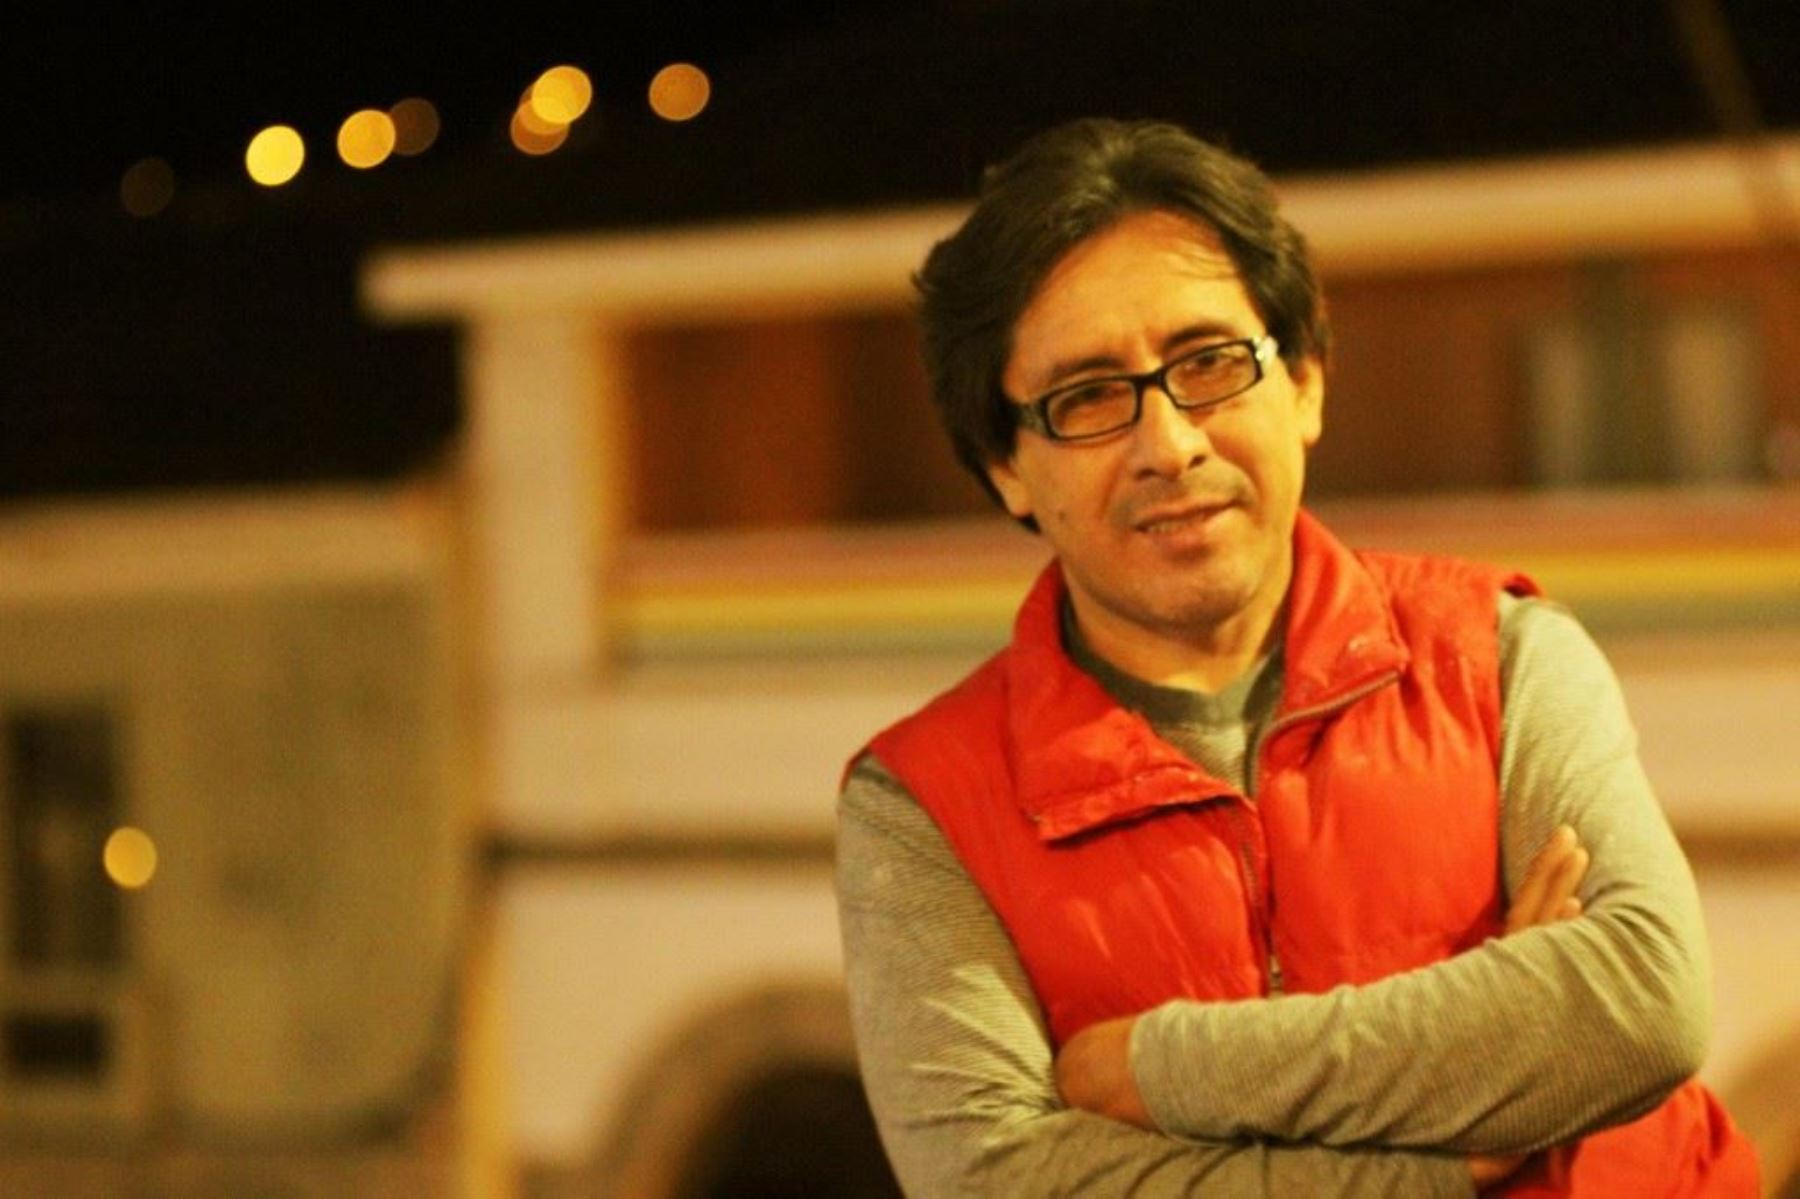 Murió Palito Ortega Matute, reconocido cineasta peruano